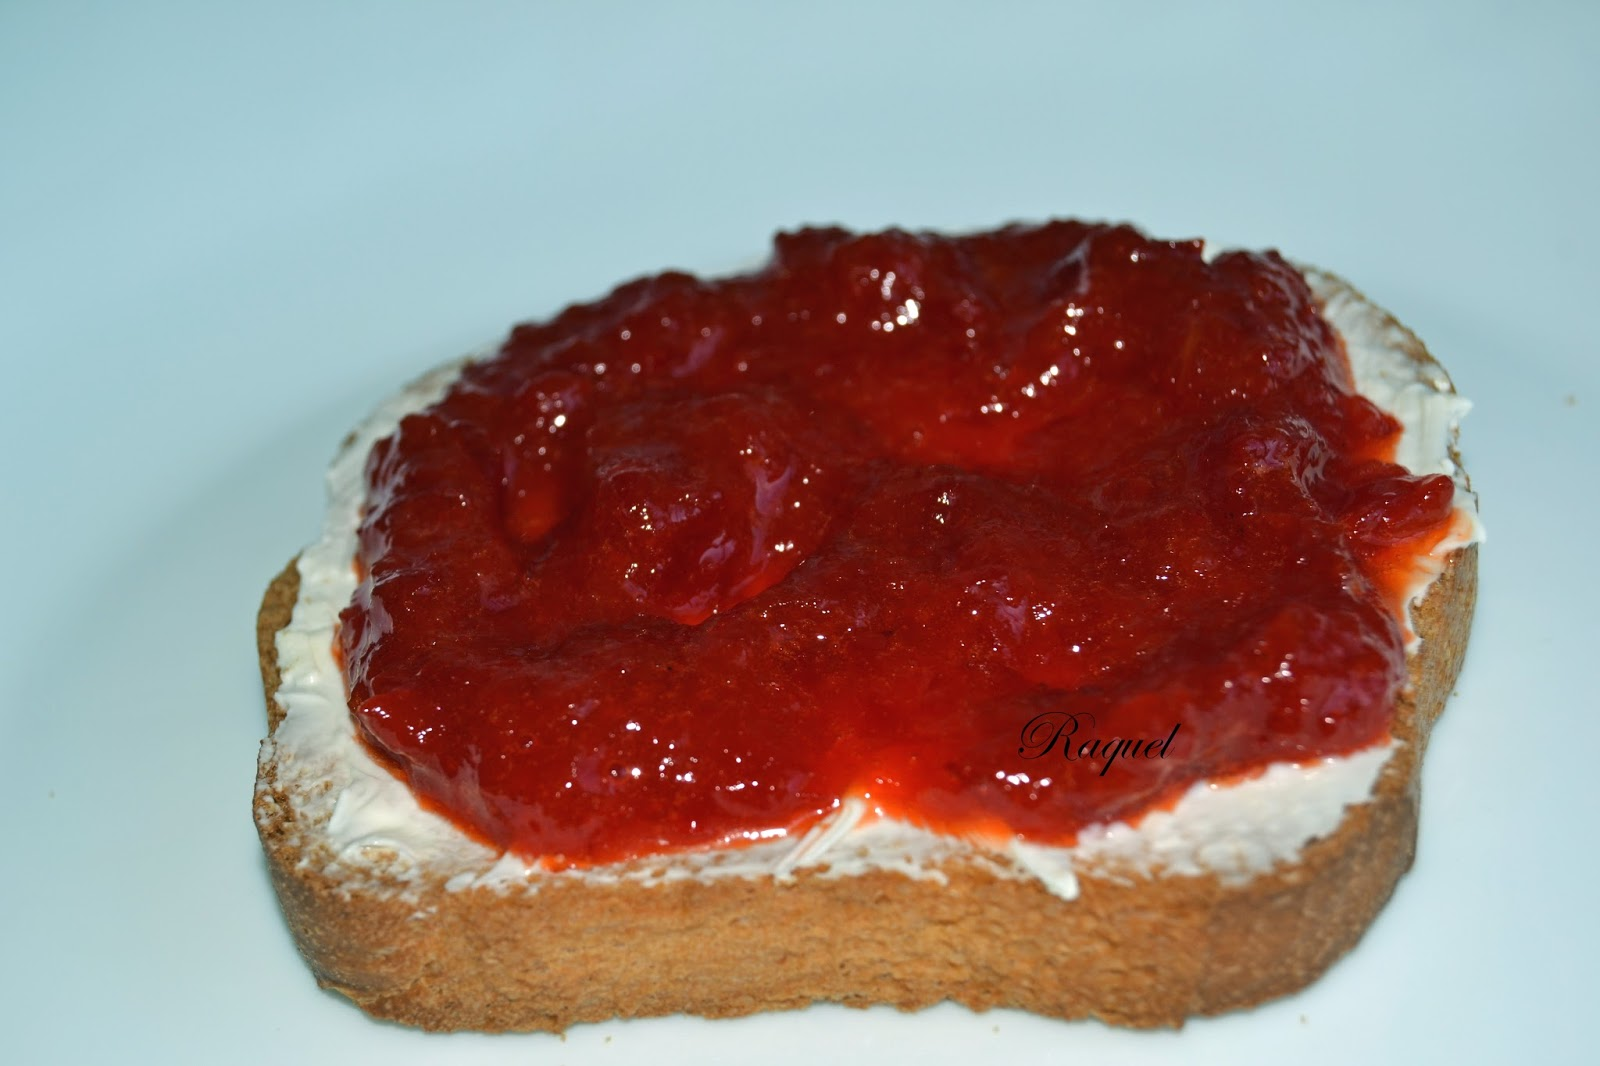 Mi diversi n en la cocina mermelada de pimientos rojos en - Mermelada de pimientos rojos ...